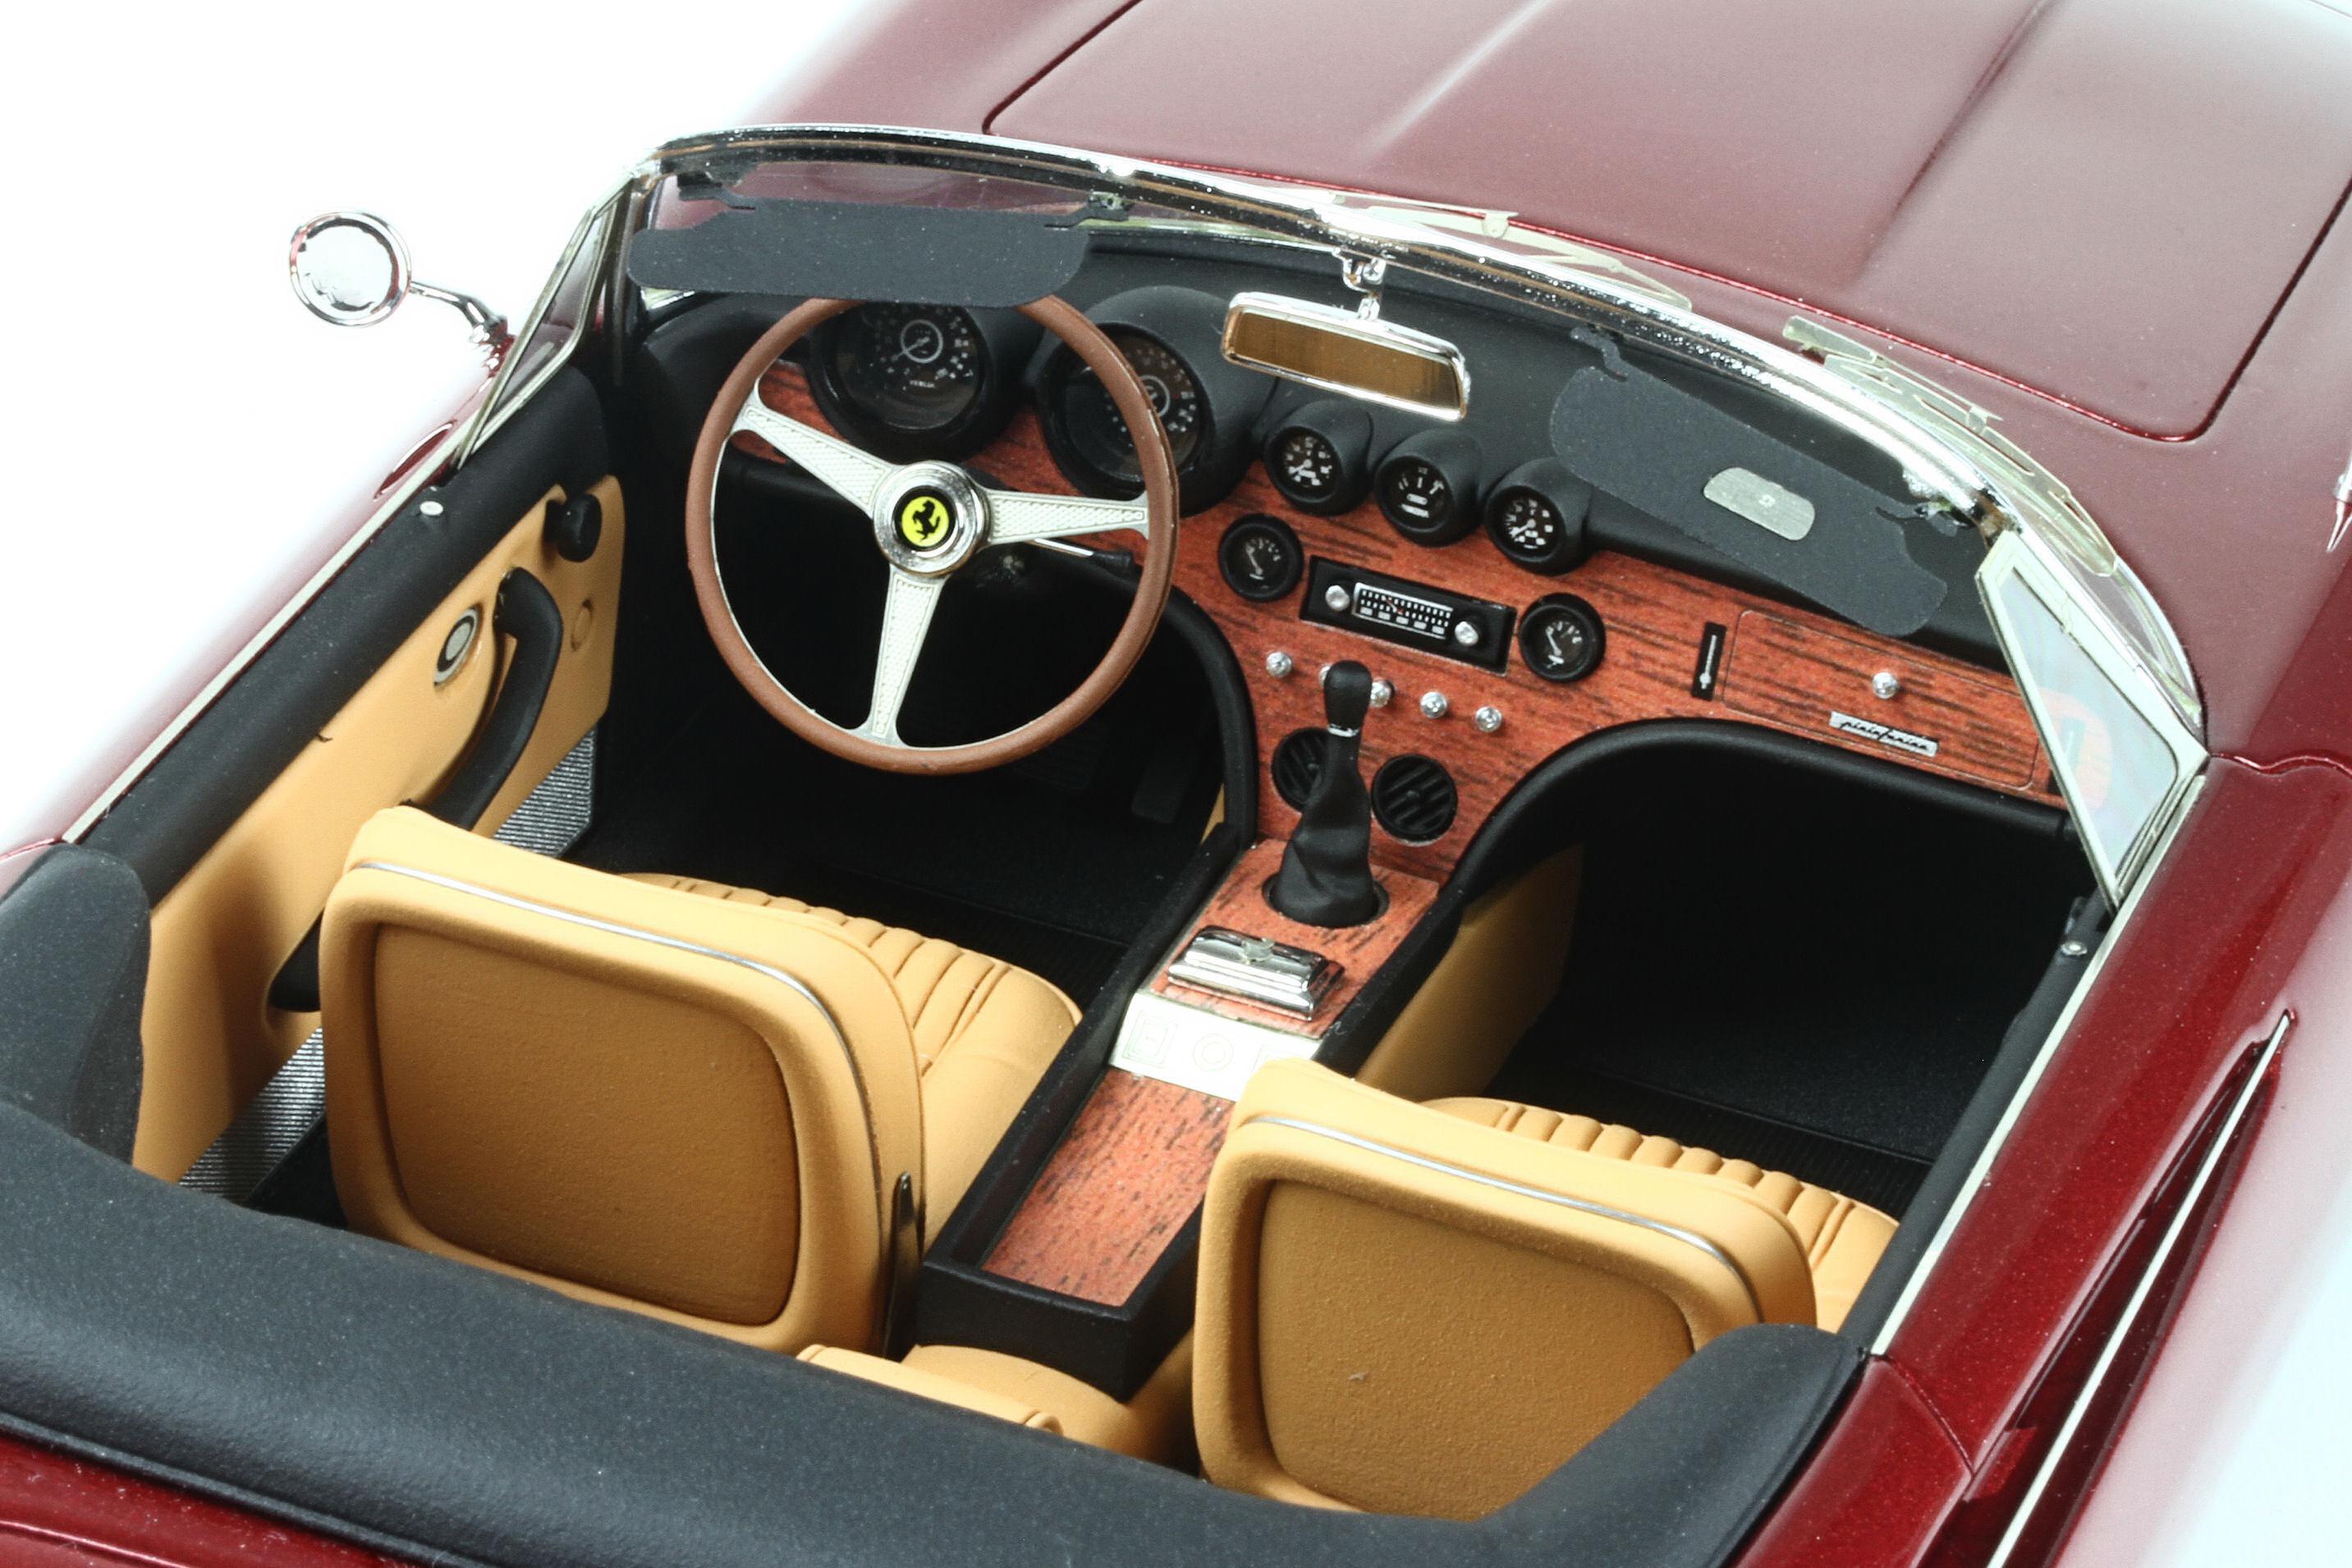 cars1809-ferrari-365-california-ex-charles-bronson-monterey-2007-2